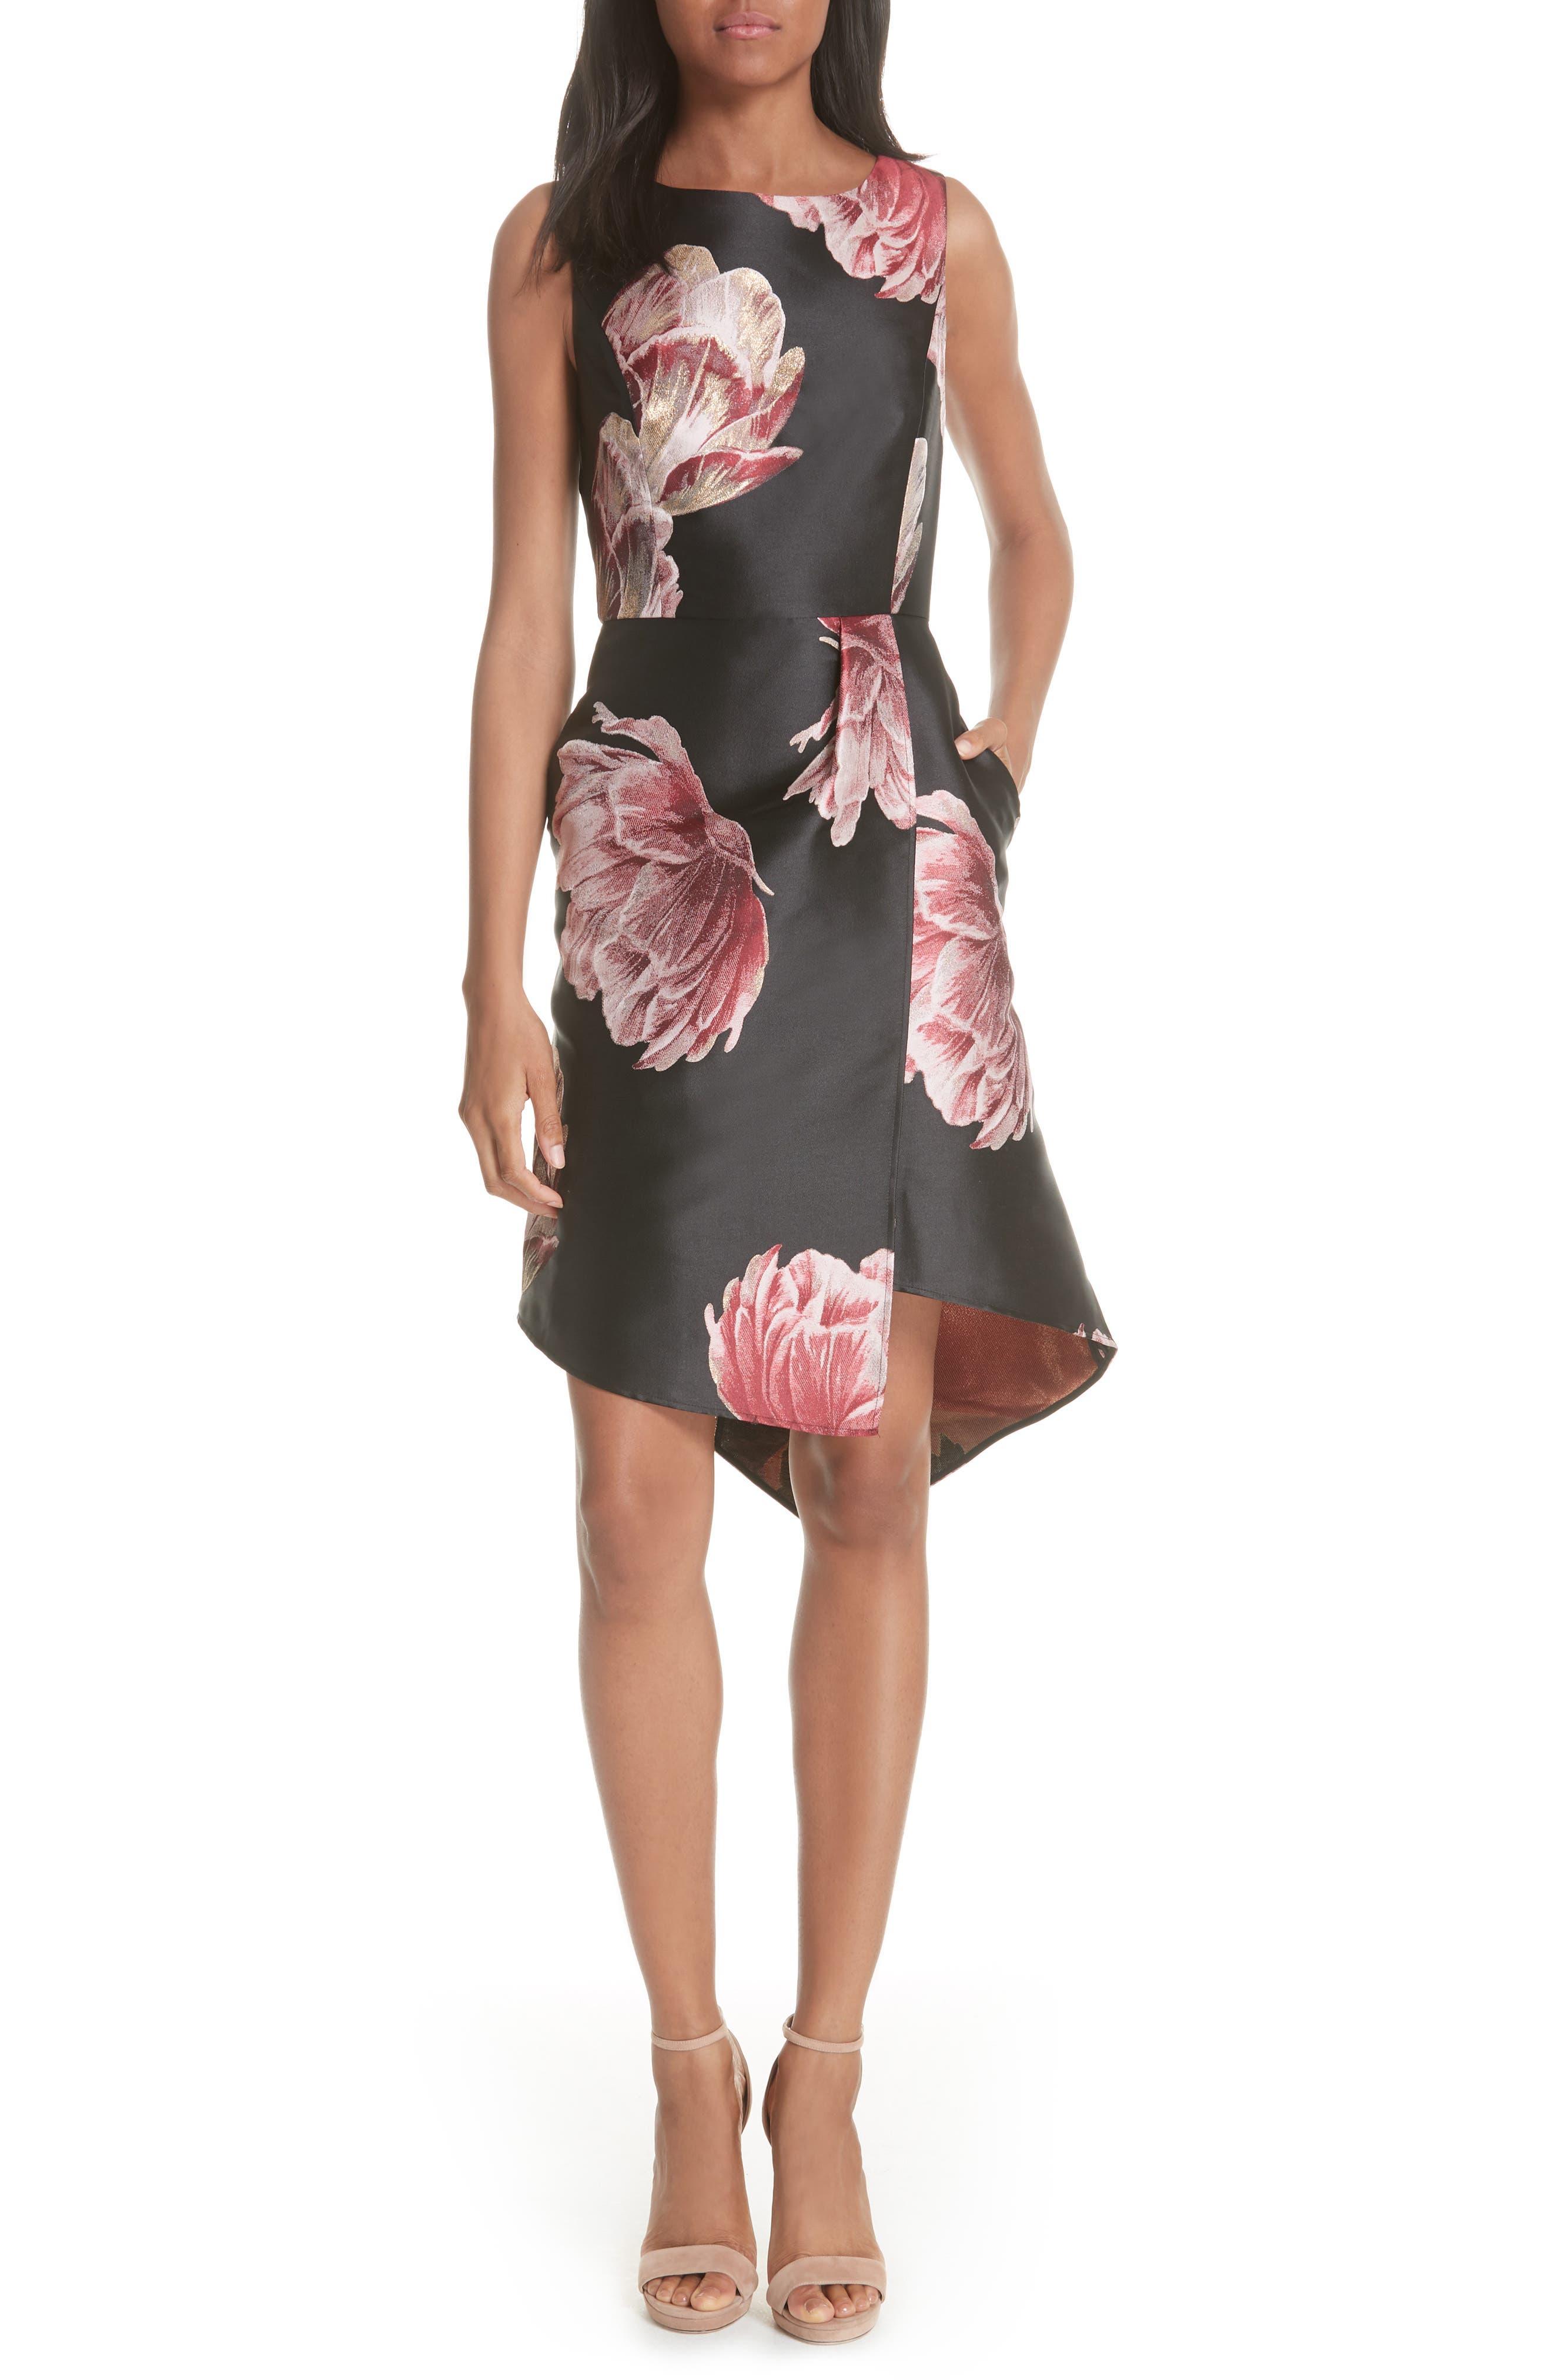 Eyvii Bay of Honour Asymmetrical Dress,                         Main,                         color, Black